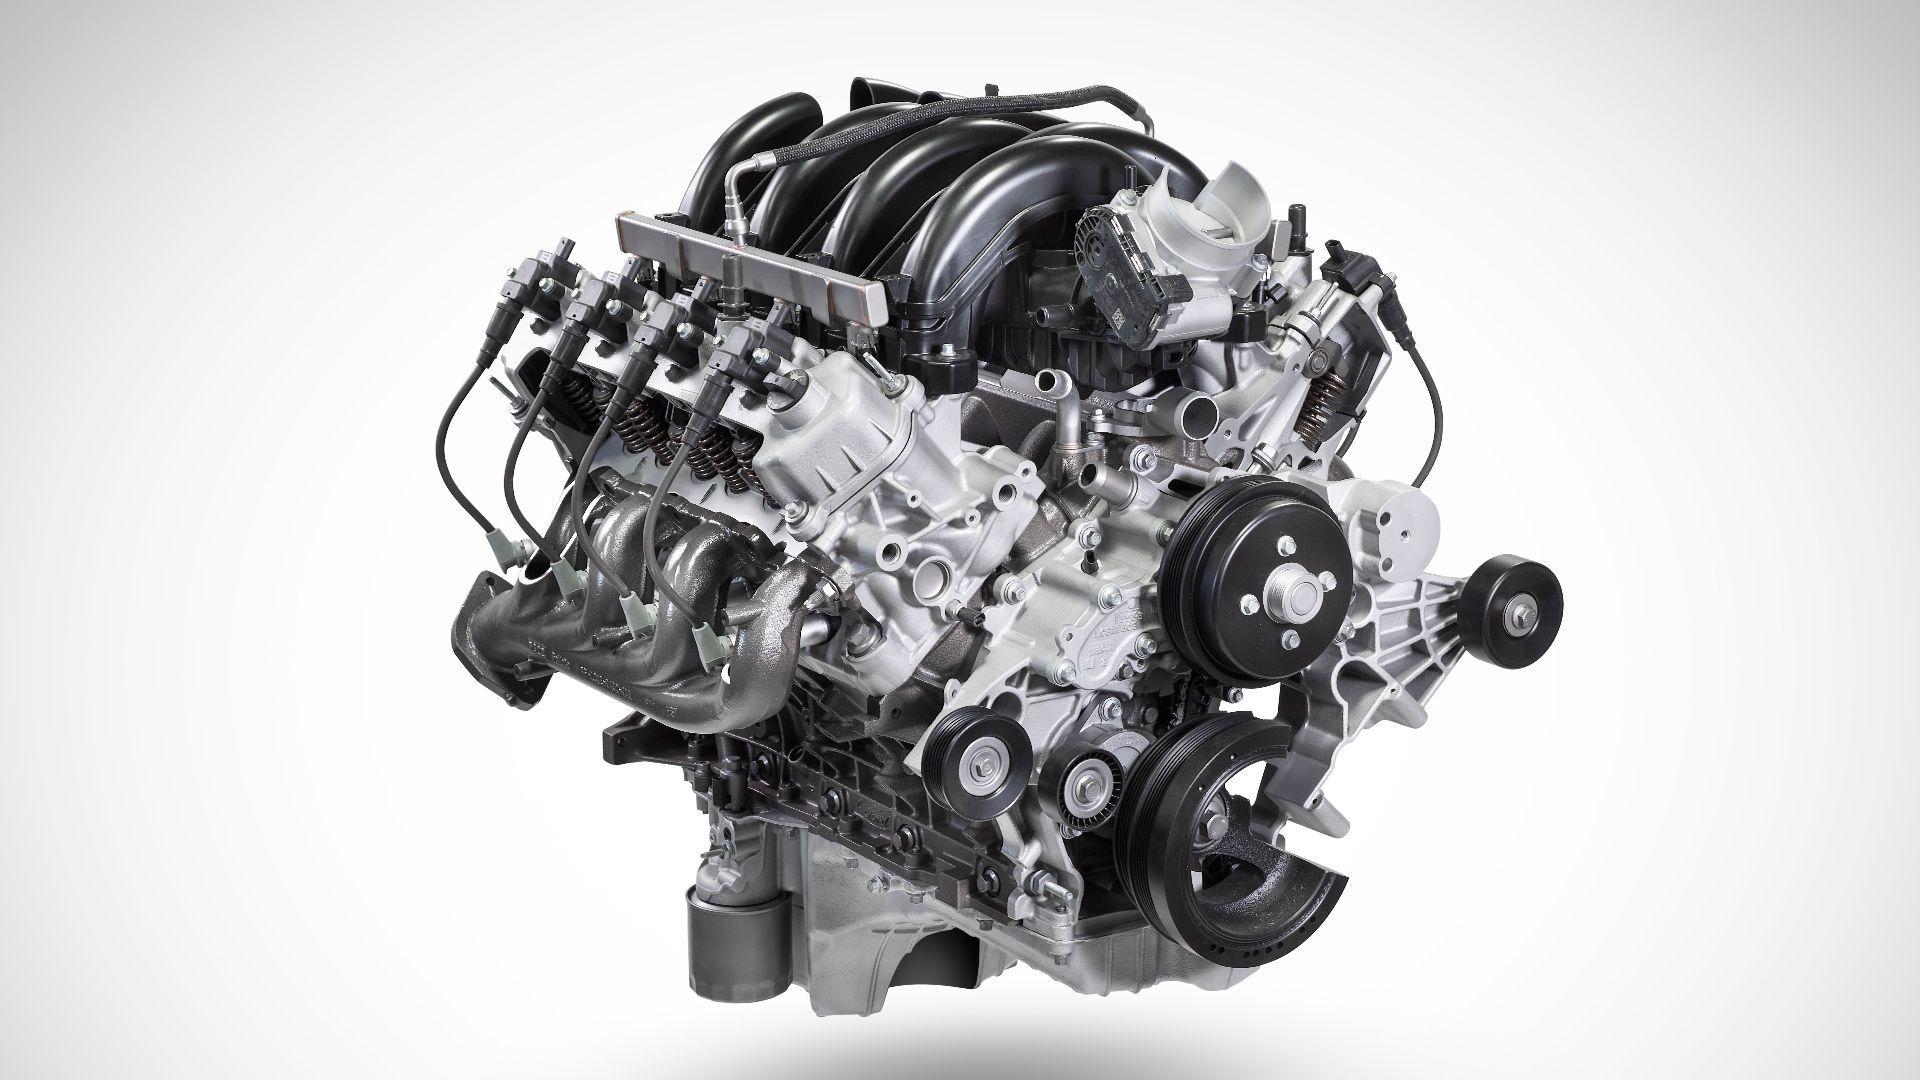 Aftermarket Supersizes The Ford Godzilla V8